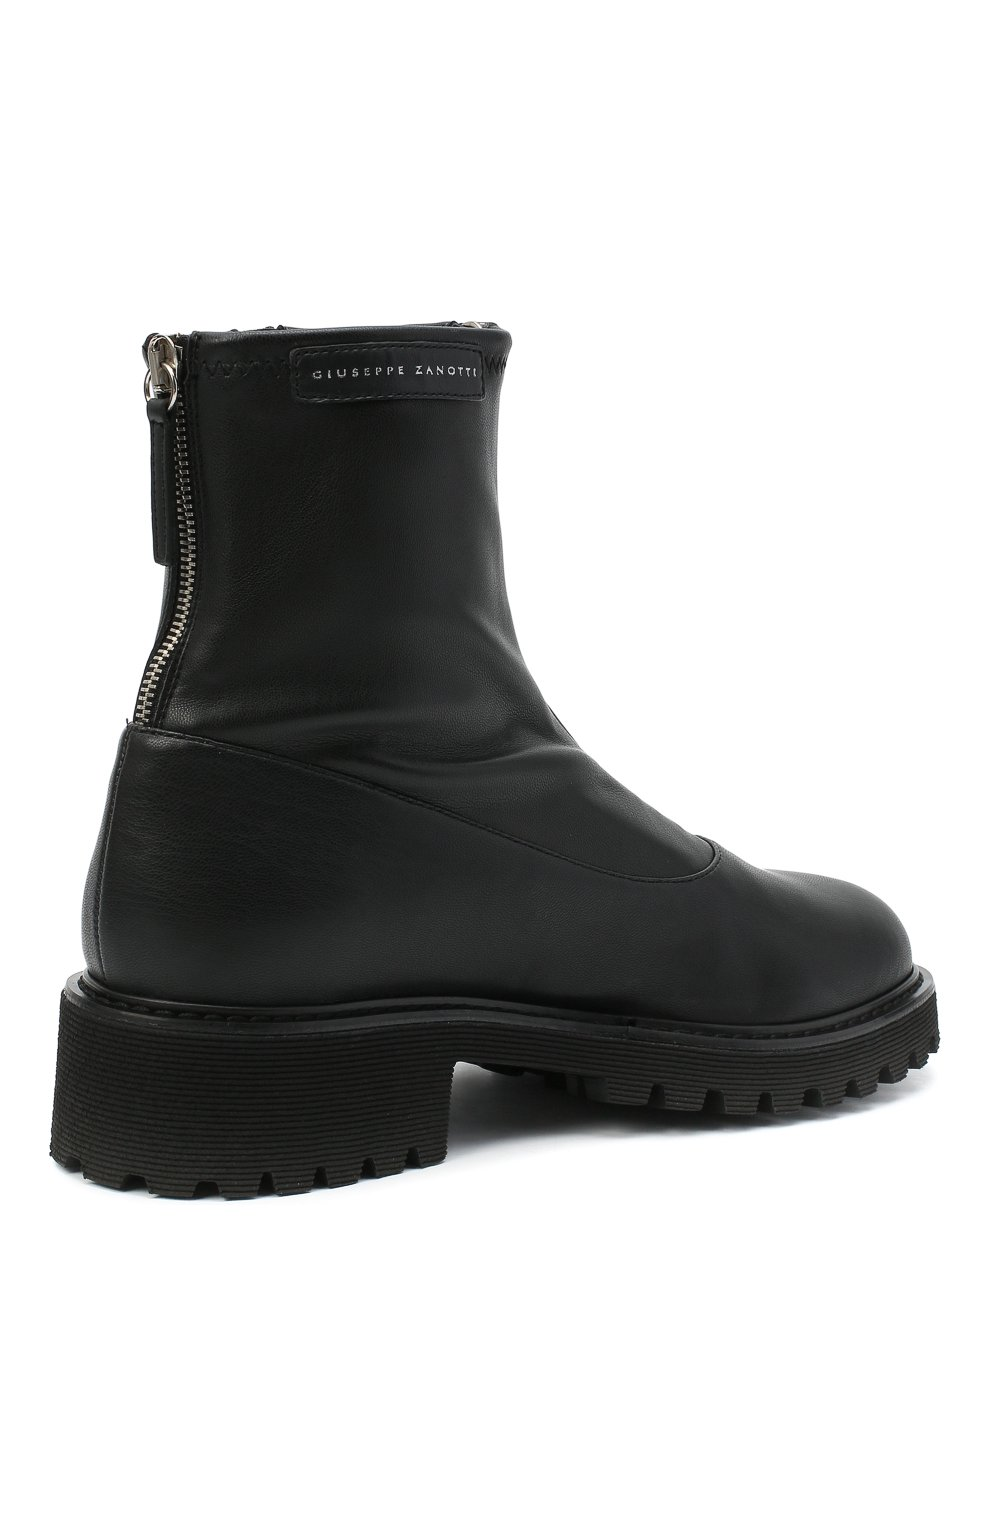 Женские ботинки avice GIUSEPPE ZANOTTI DESIGN черного цвета, арт. I970020/001 | Фото 4